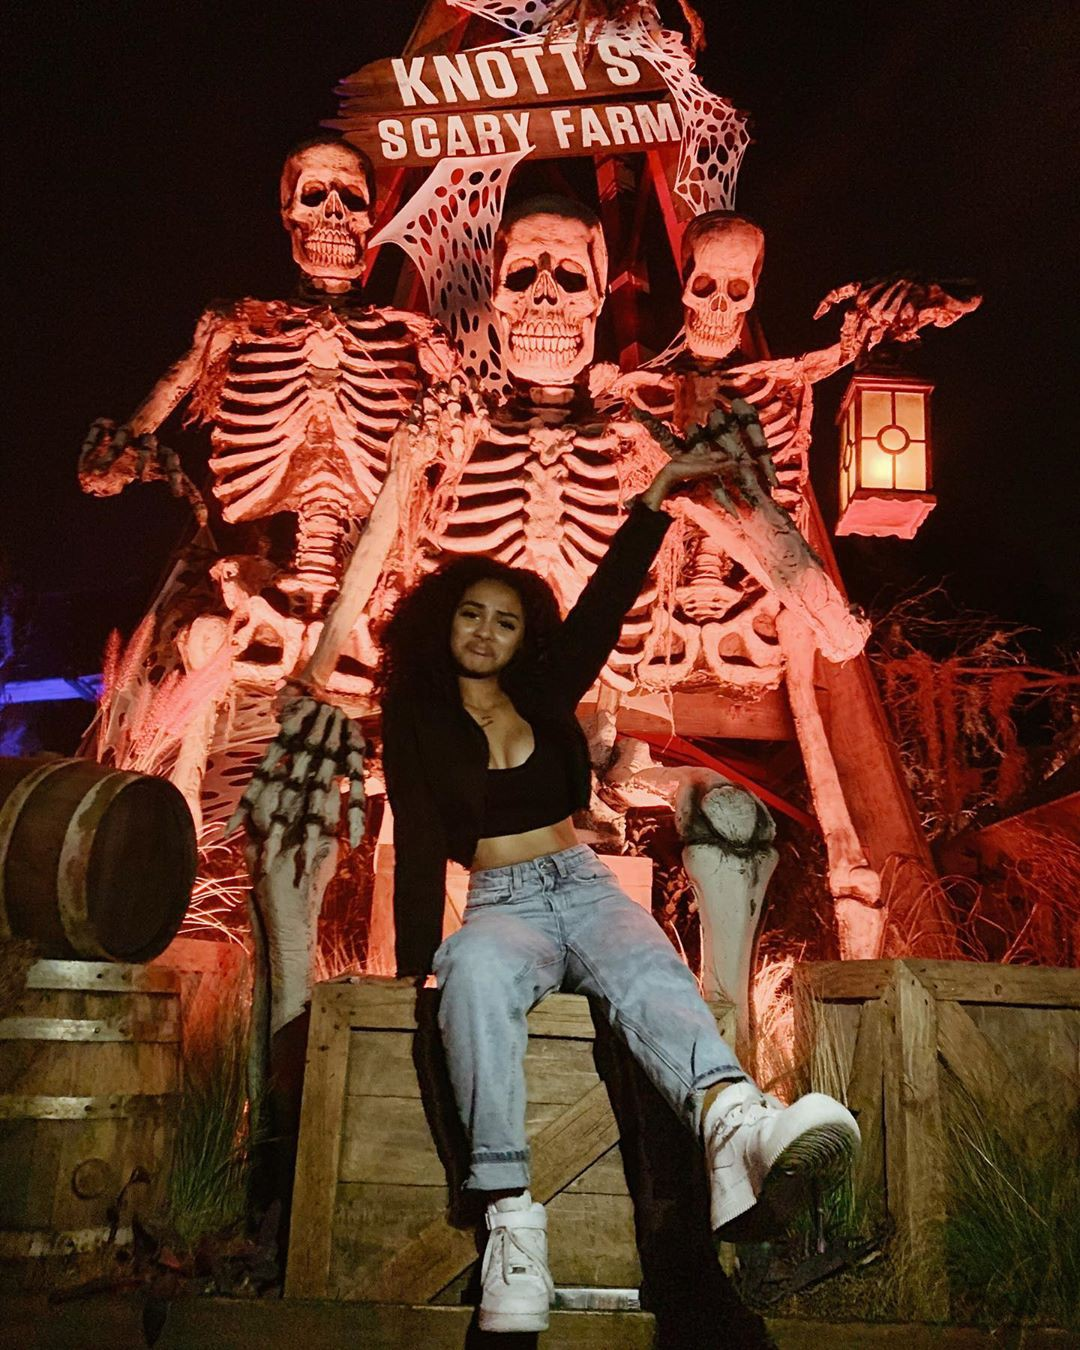 Daniella Perkins having fun, theatrical property, performance art